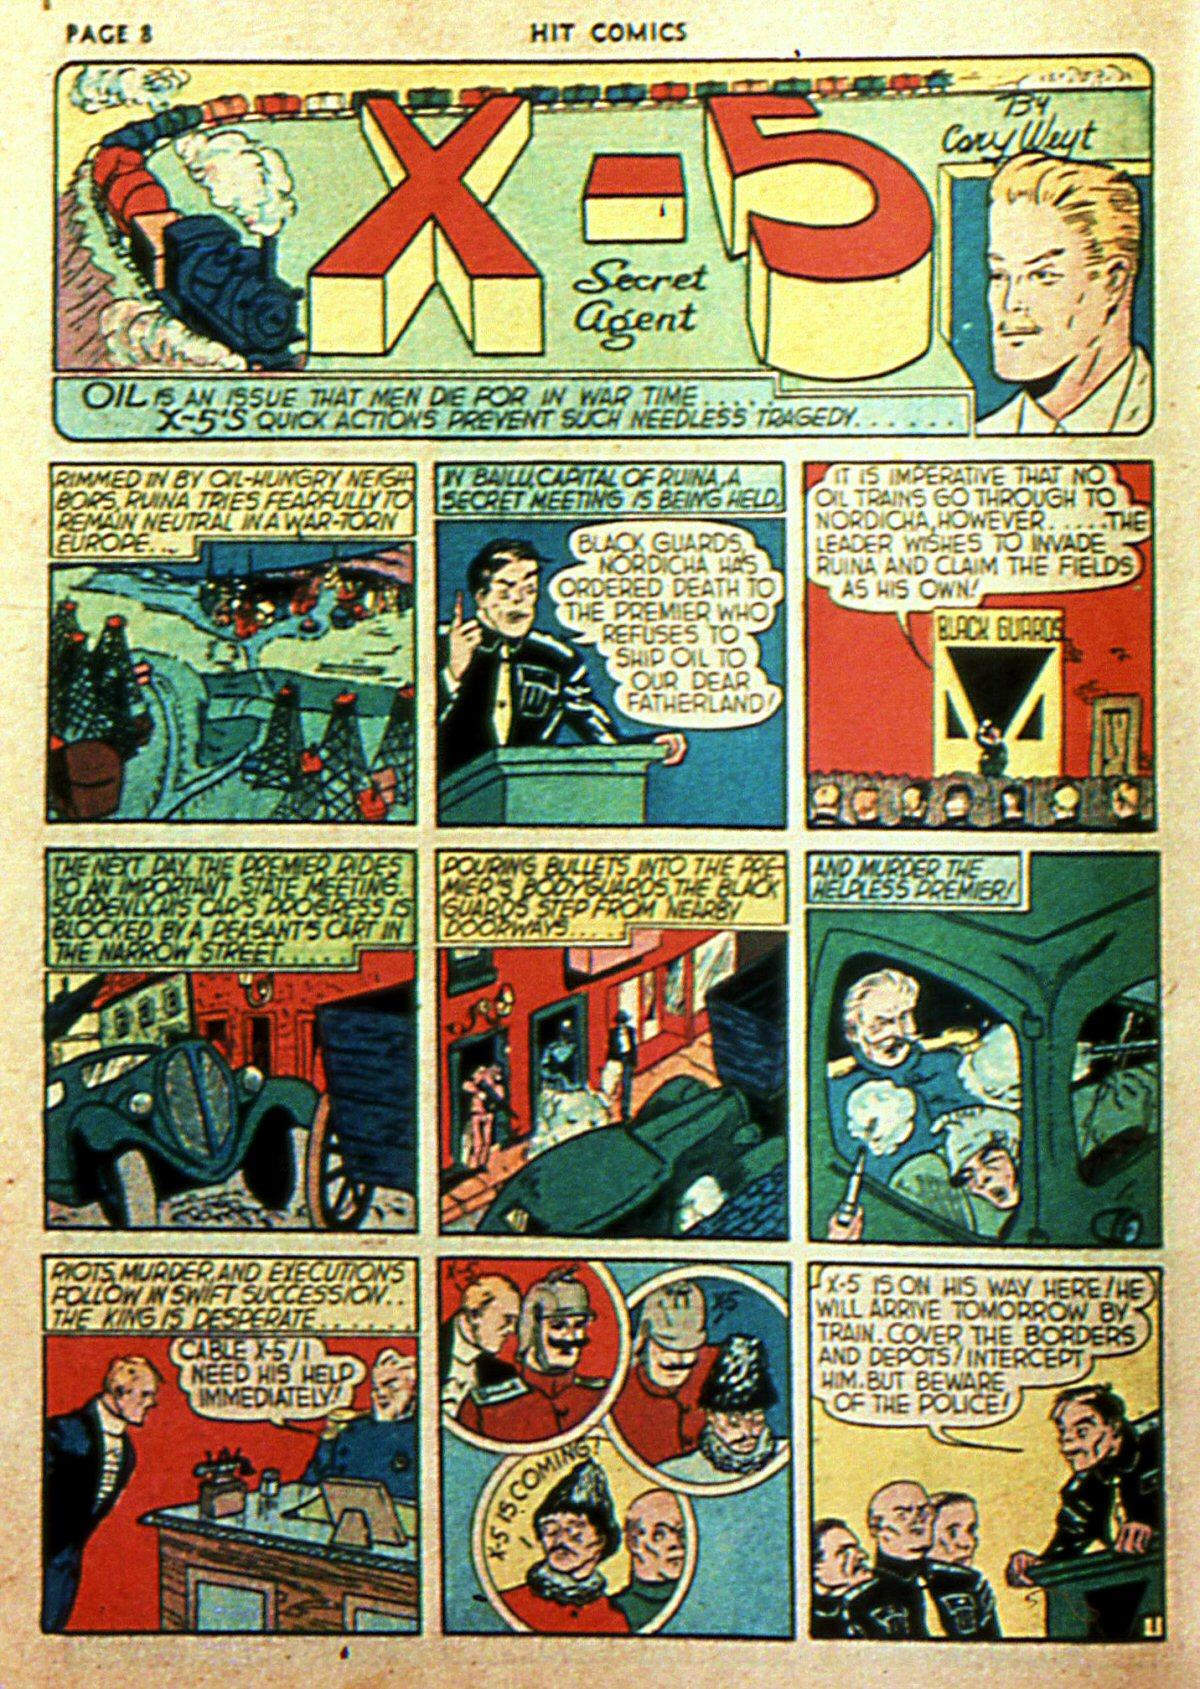 Read online Hit Comics comic -  Issue #2 - 10